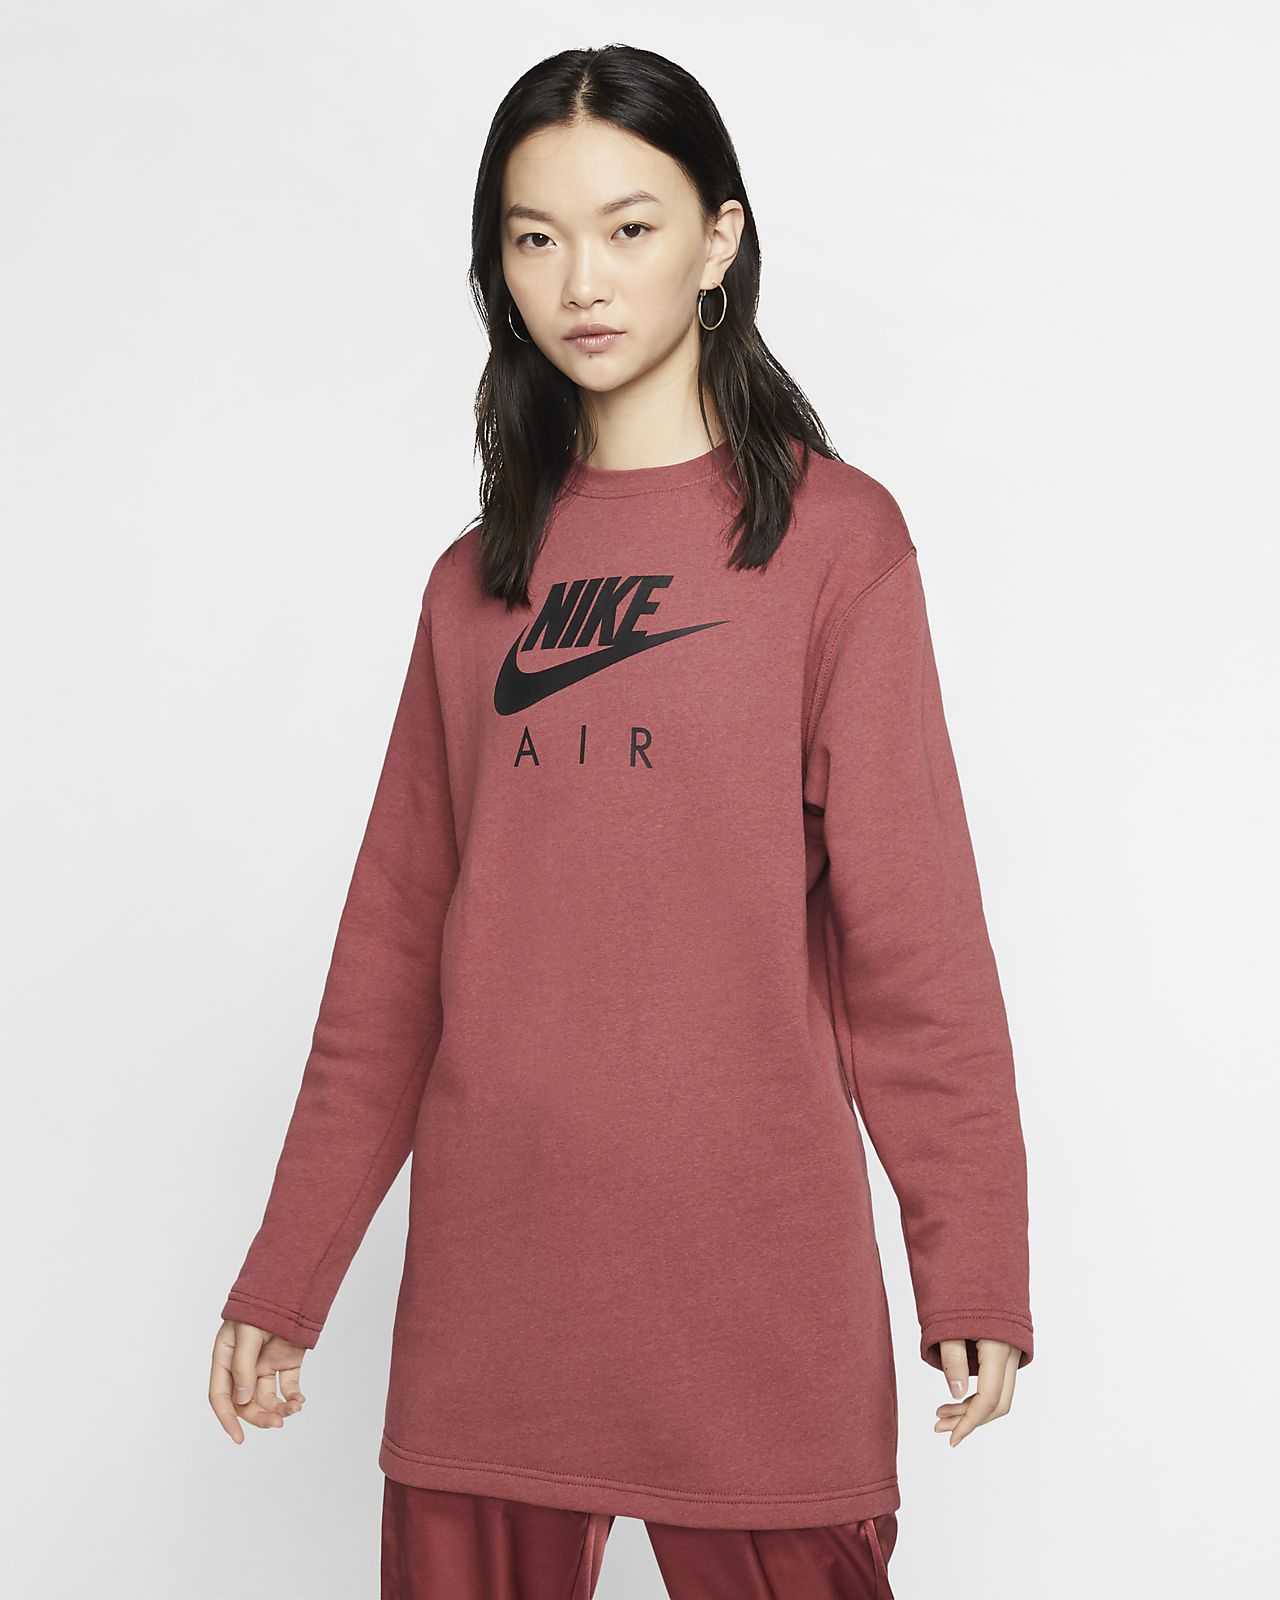 Damska sukienka z dzianiny Nike Air